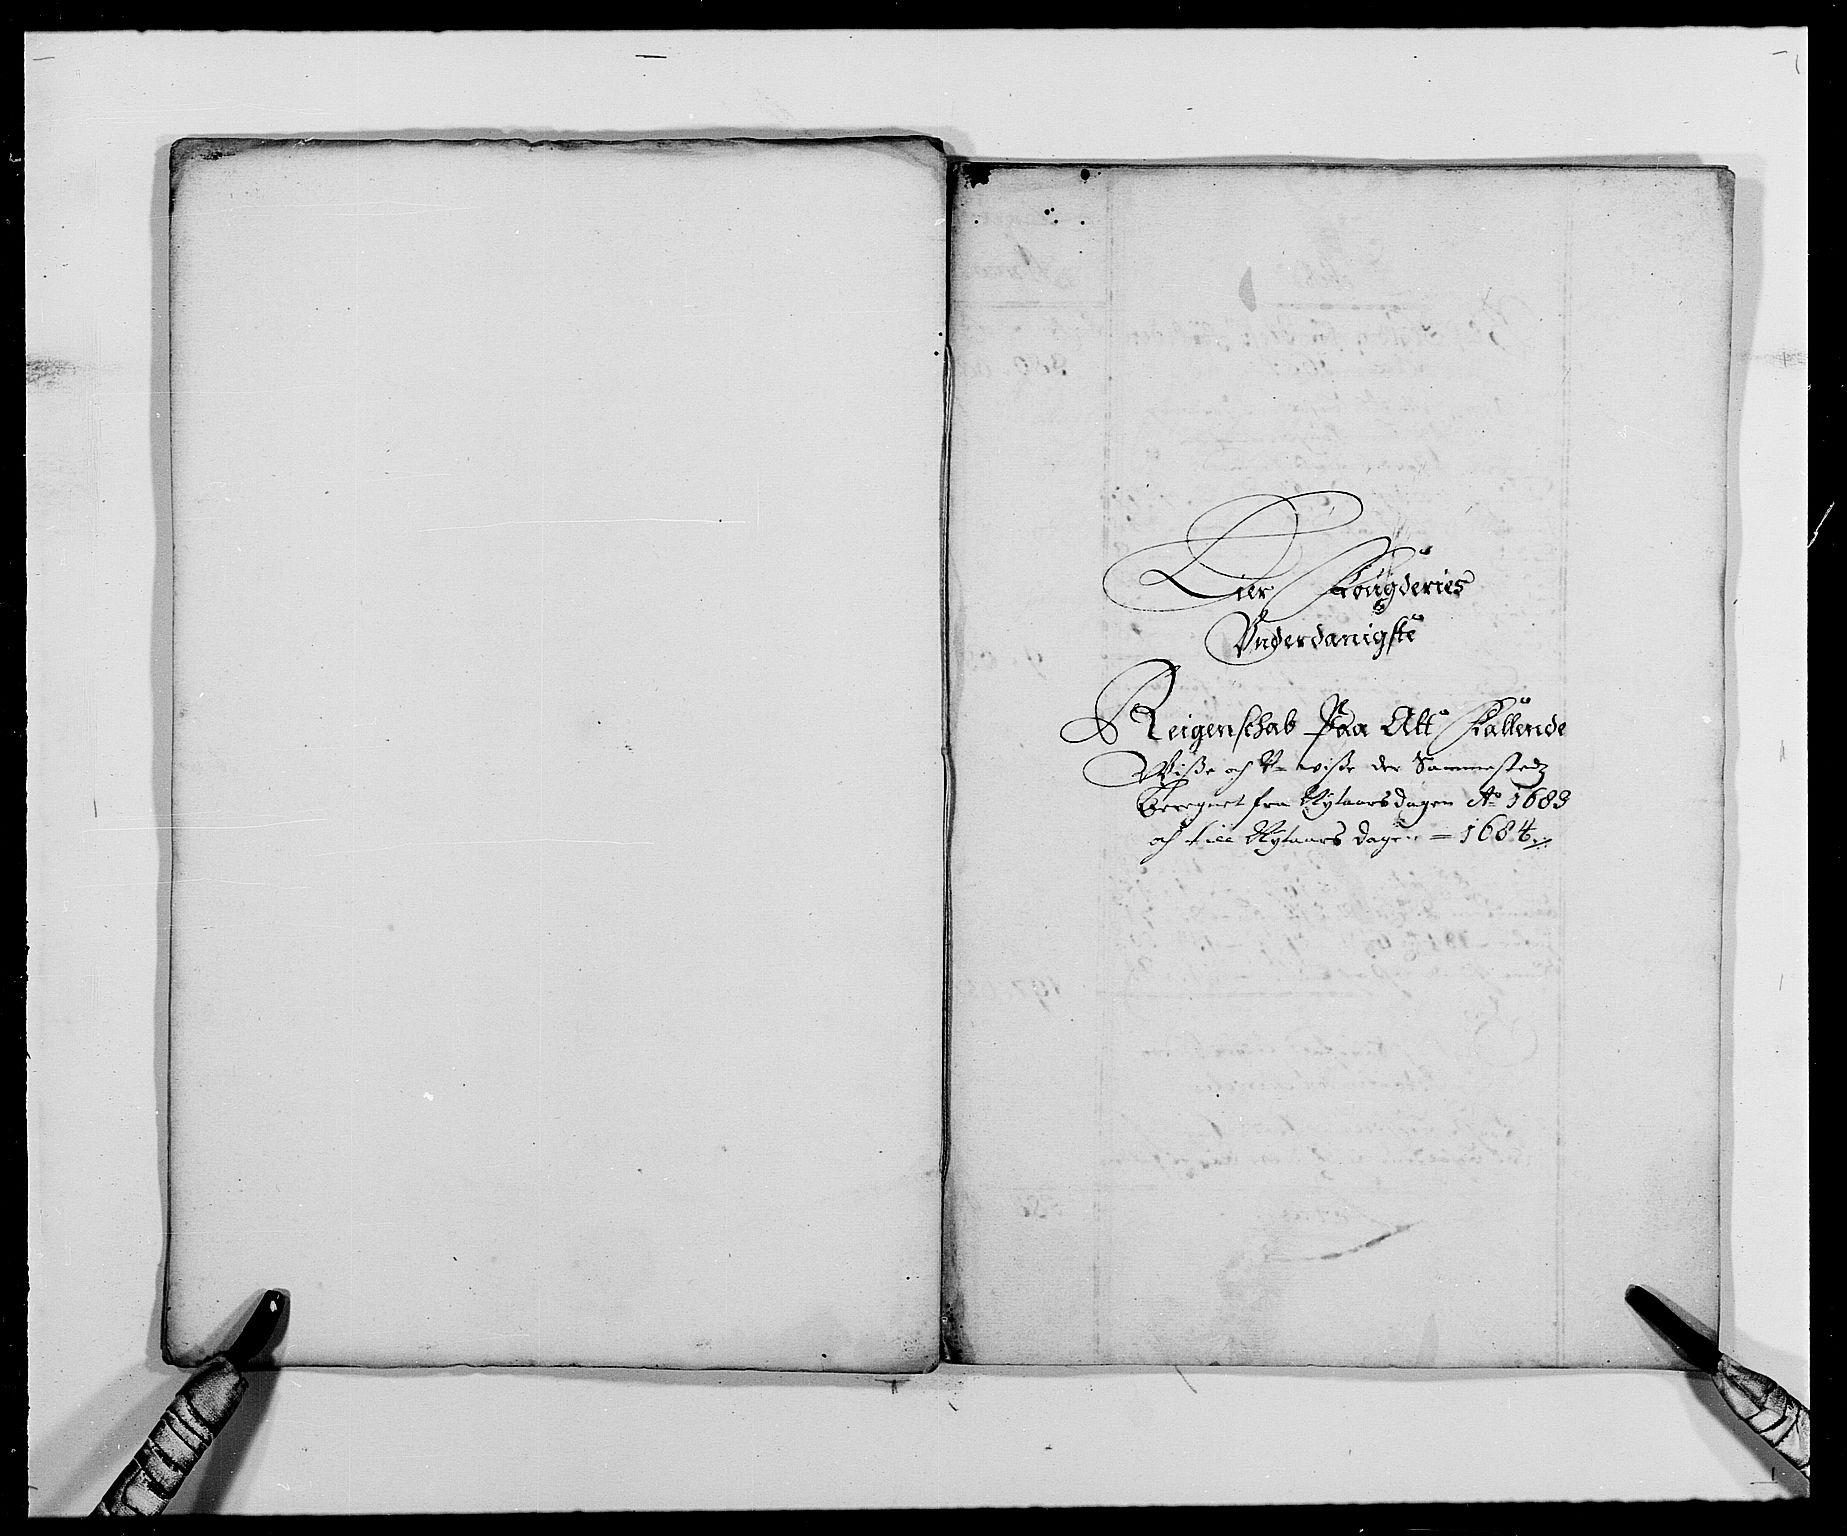 RA, Rentekammeret inntil 1814, Reviderte regnskaper, Fogderegnskap, R27/L1687: Fogderegnskap Lier, 1678-1686, s. 314